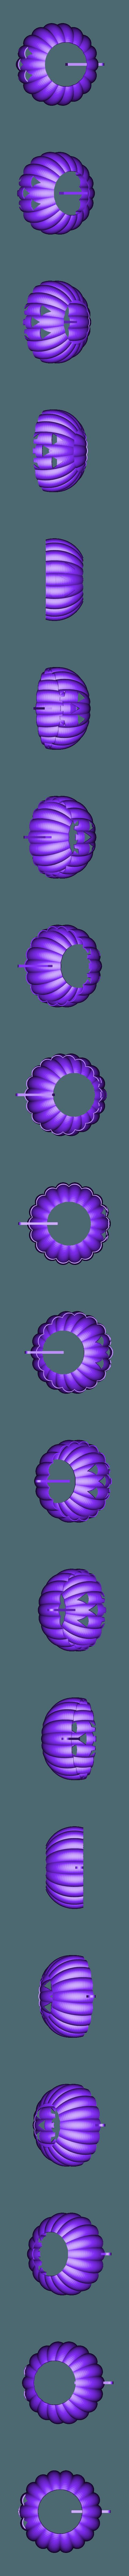 Pumpkin_Body.stl Download free STL file Visions of Halloween Danced In Her (His) Head, Motorized • 3D printing template, gzumwalt